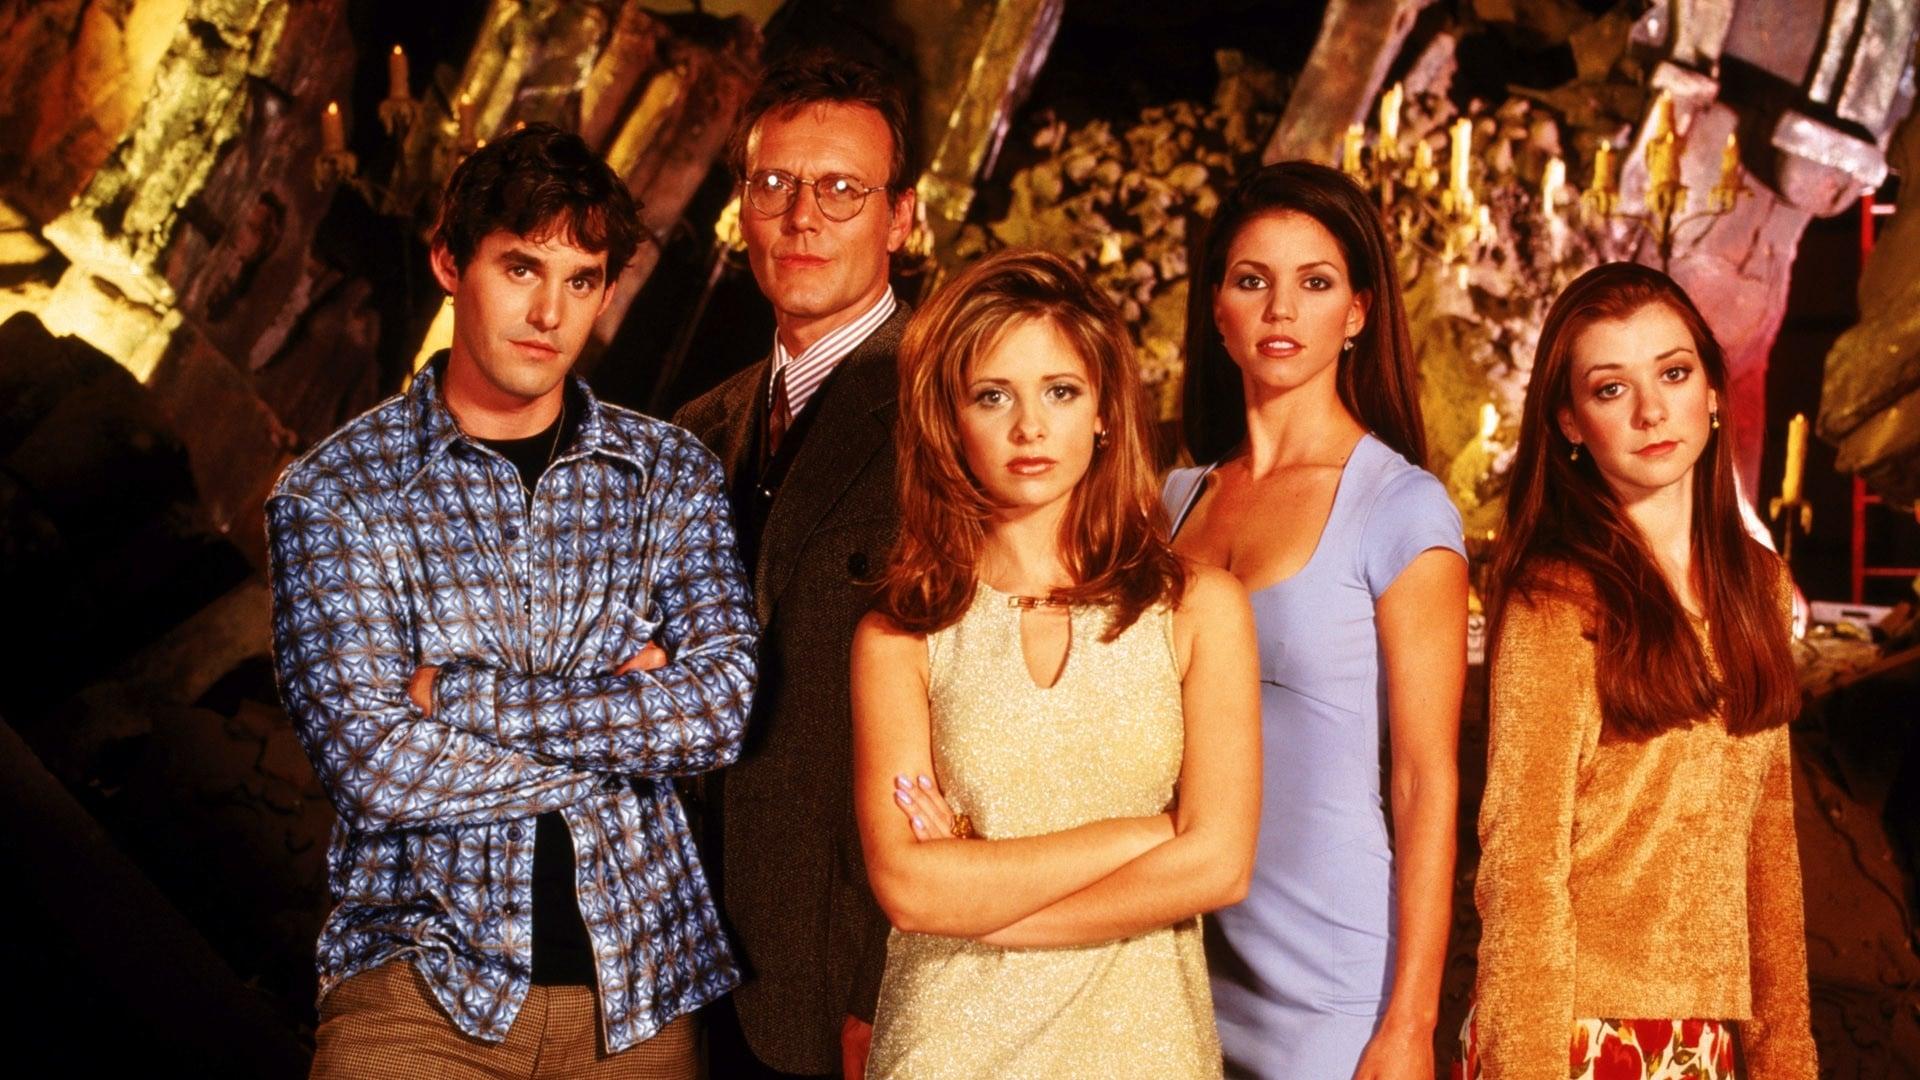 Баффи Истребительница Вампиров/Buffy The Vampire Slayer